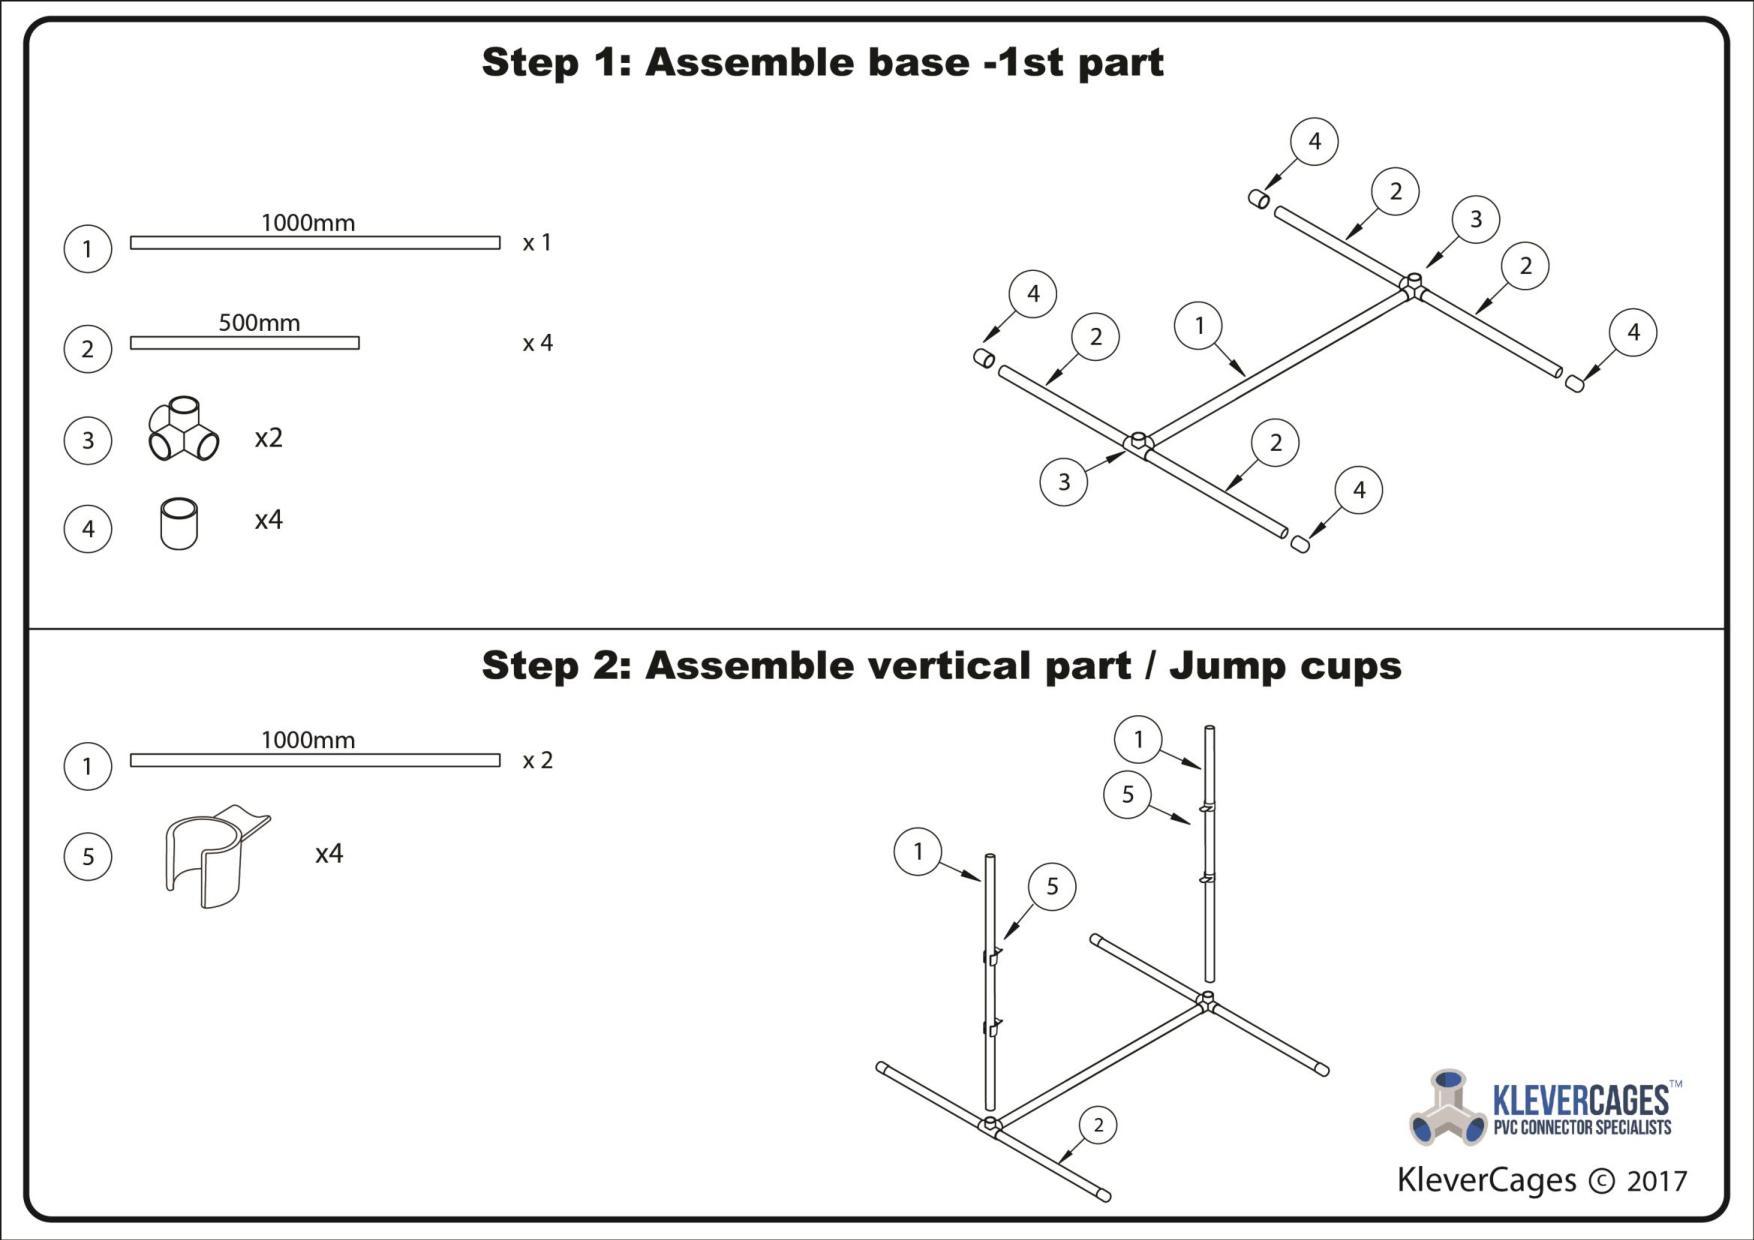 Step 1 - Assemble the base